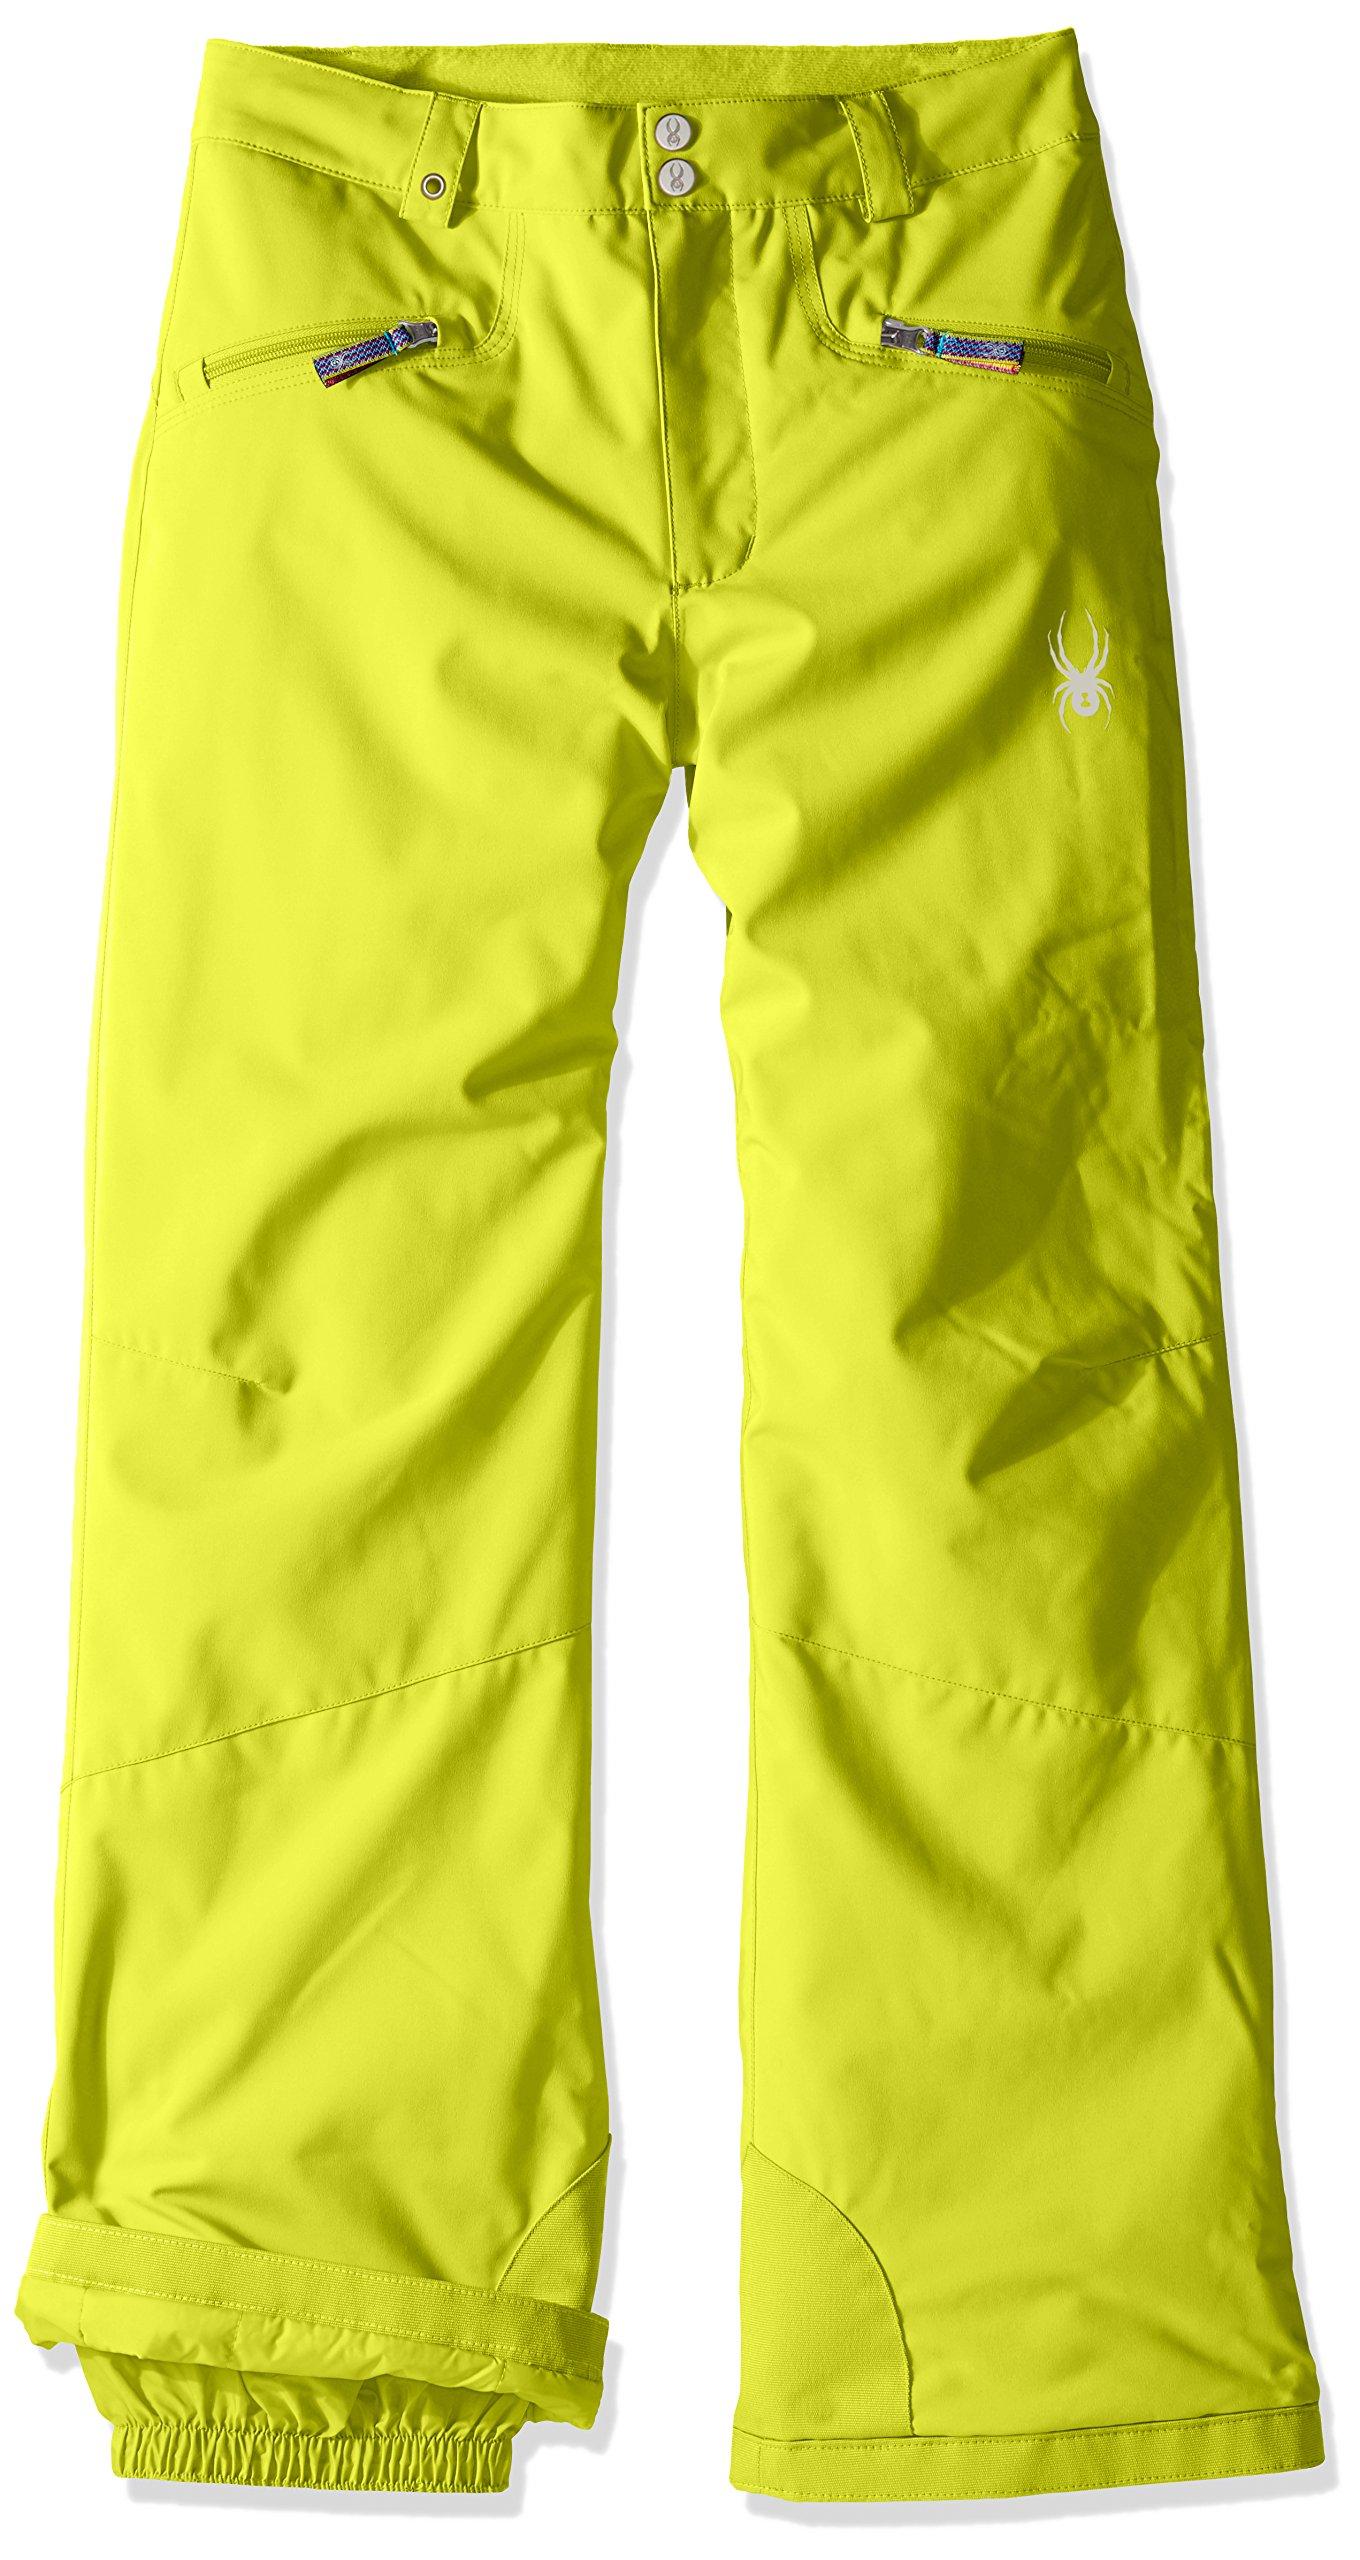 Spyder Girls Vixen Athletic Pants, Size 18, Acid